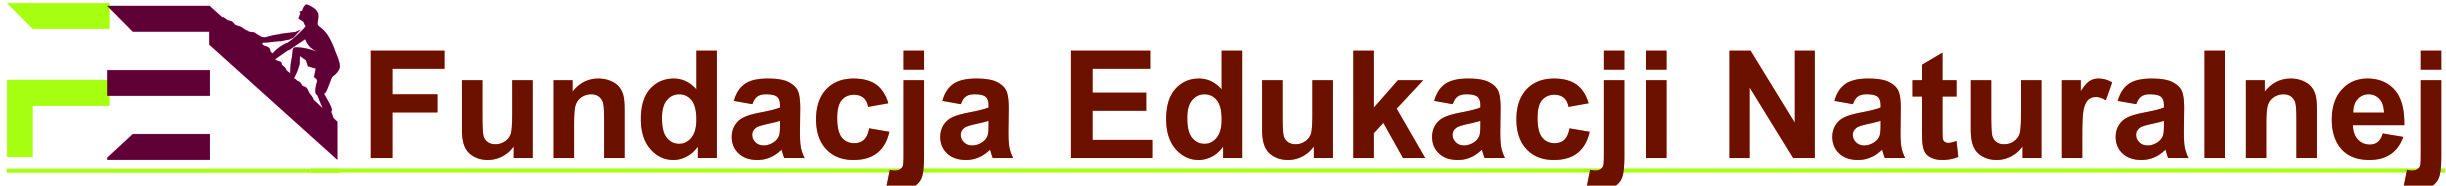 Fundacja Edukacji Naturalnej